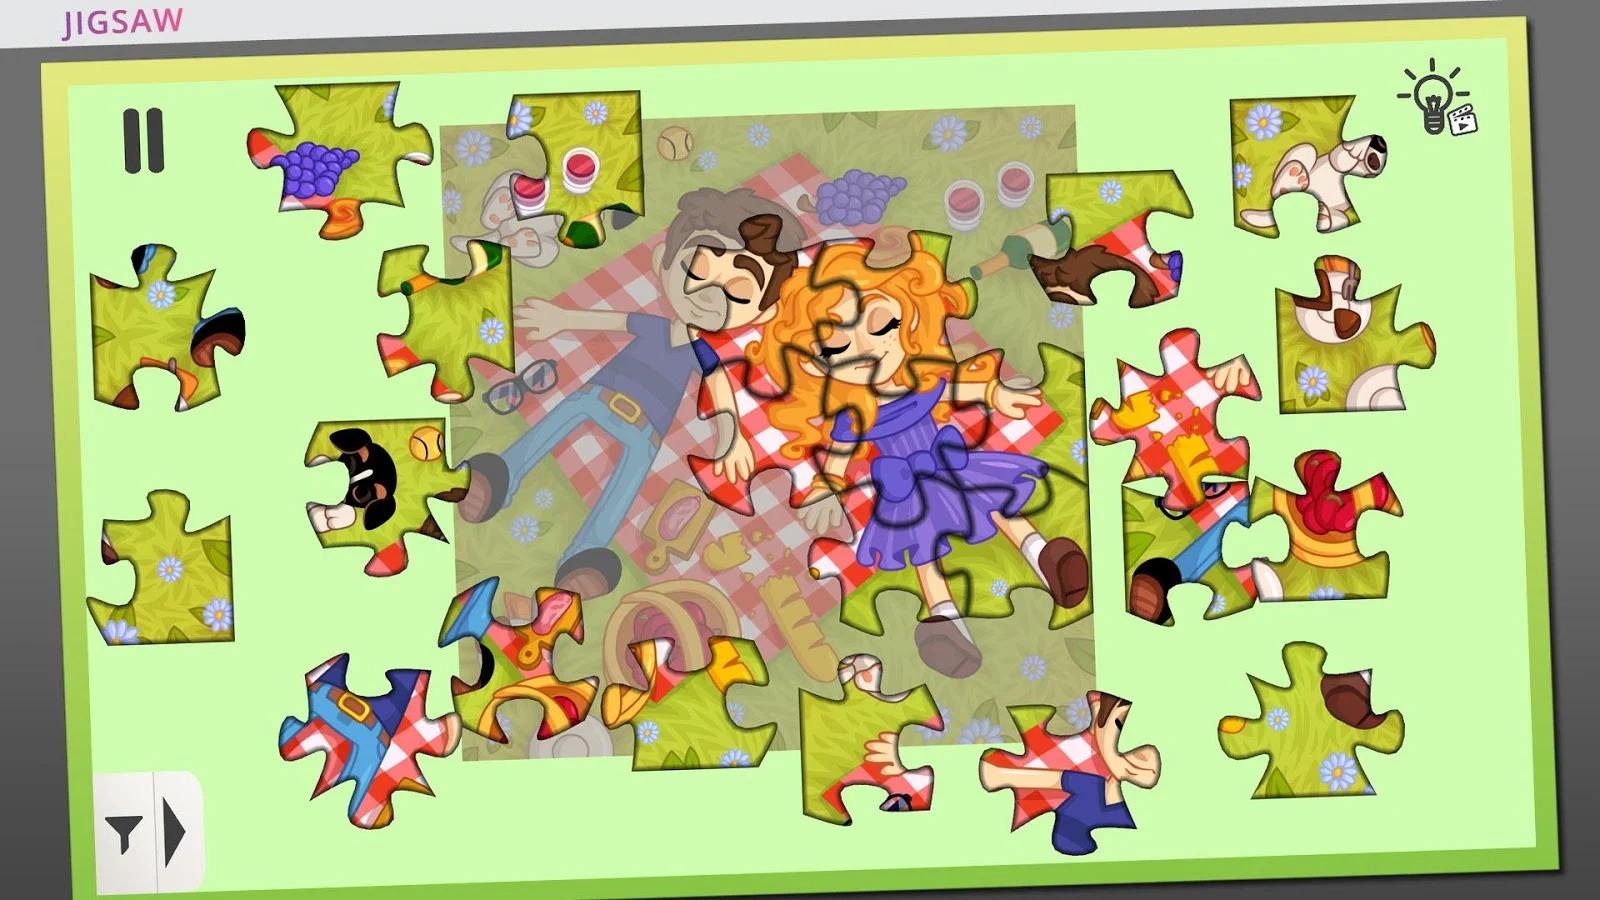 Jigsaw Apk İndir